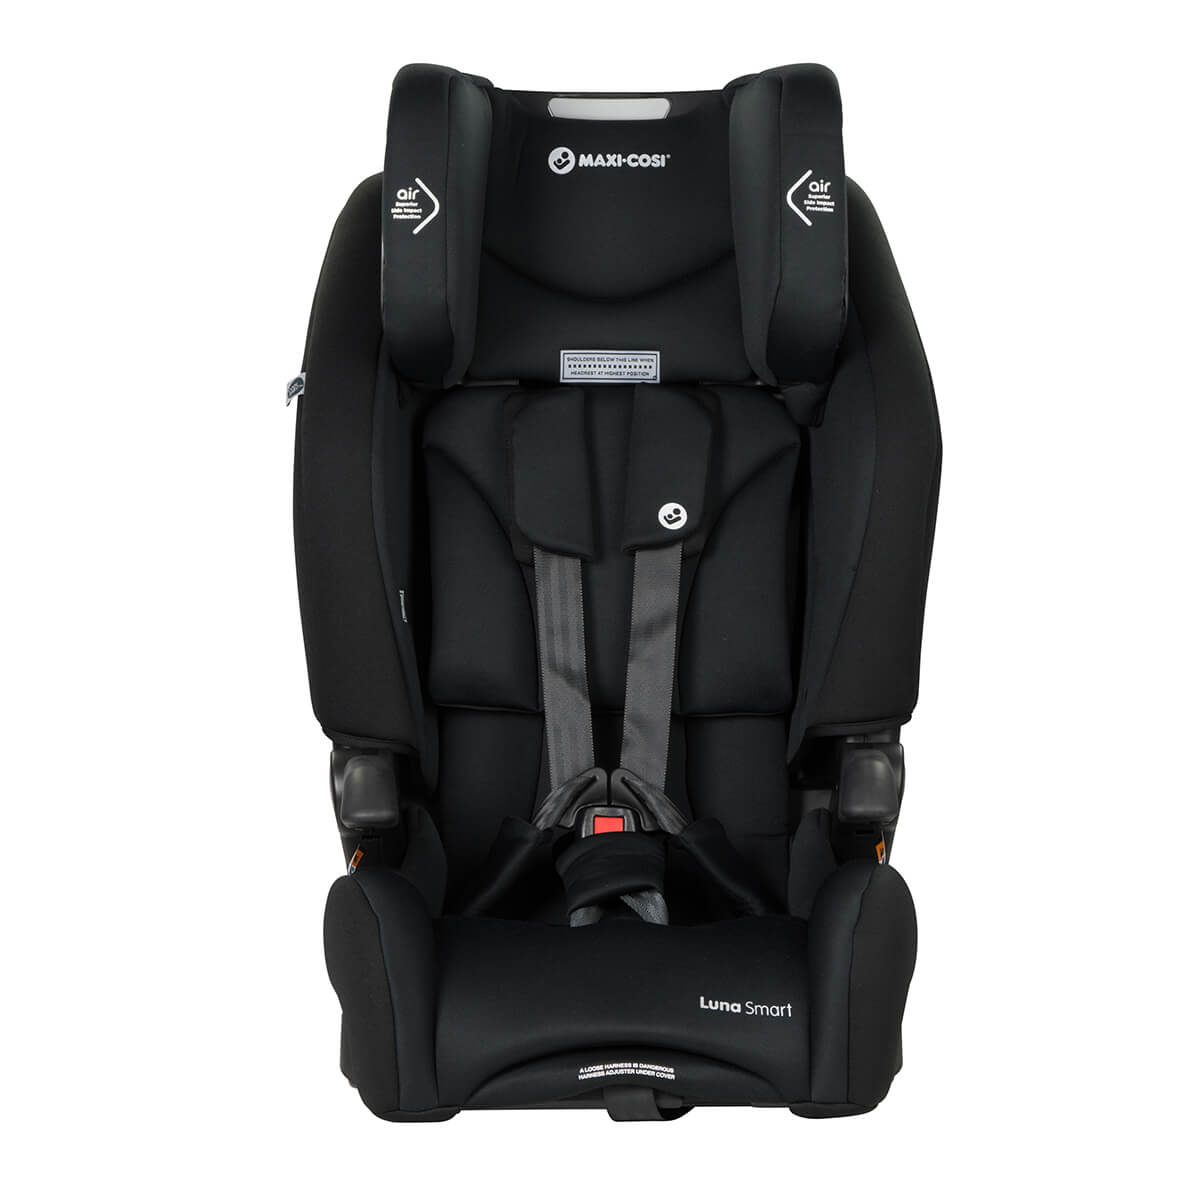 luna smart booster seat - harness adjustment